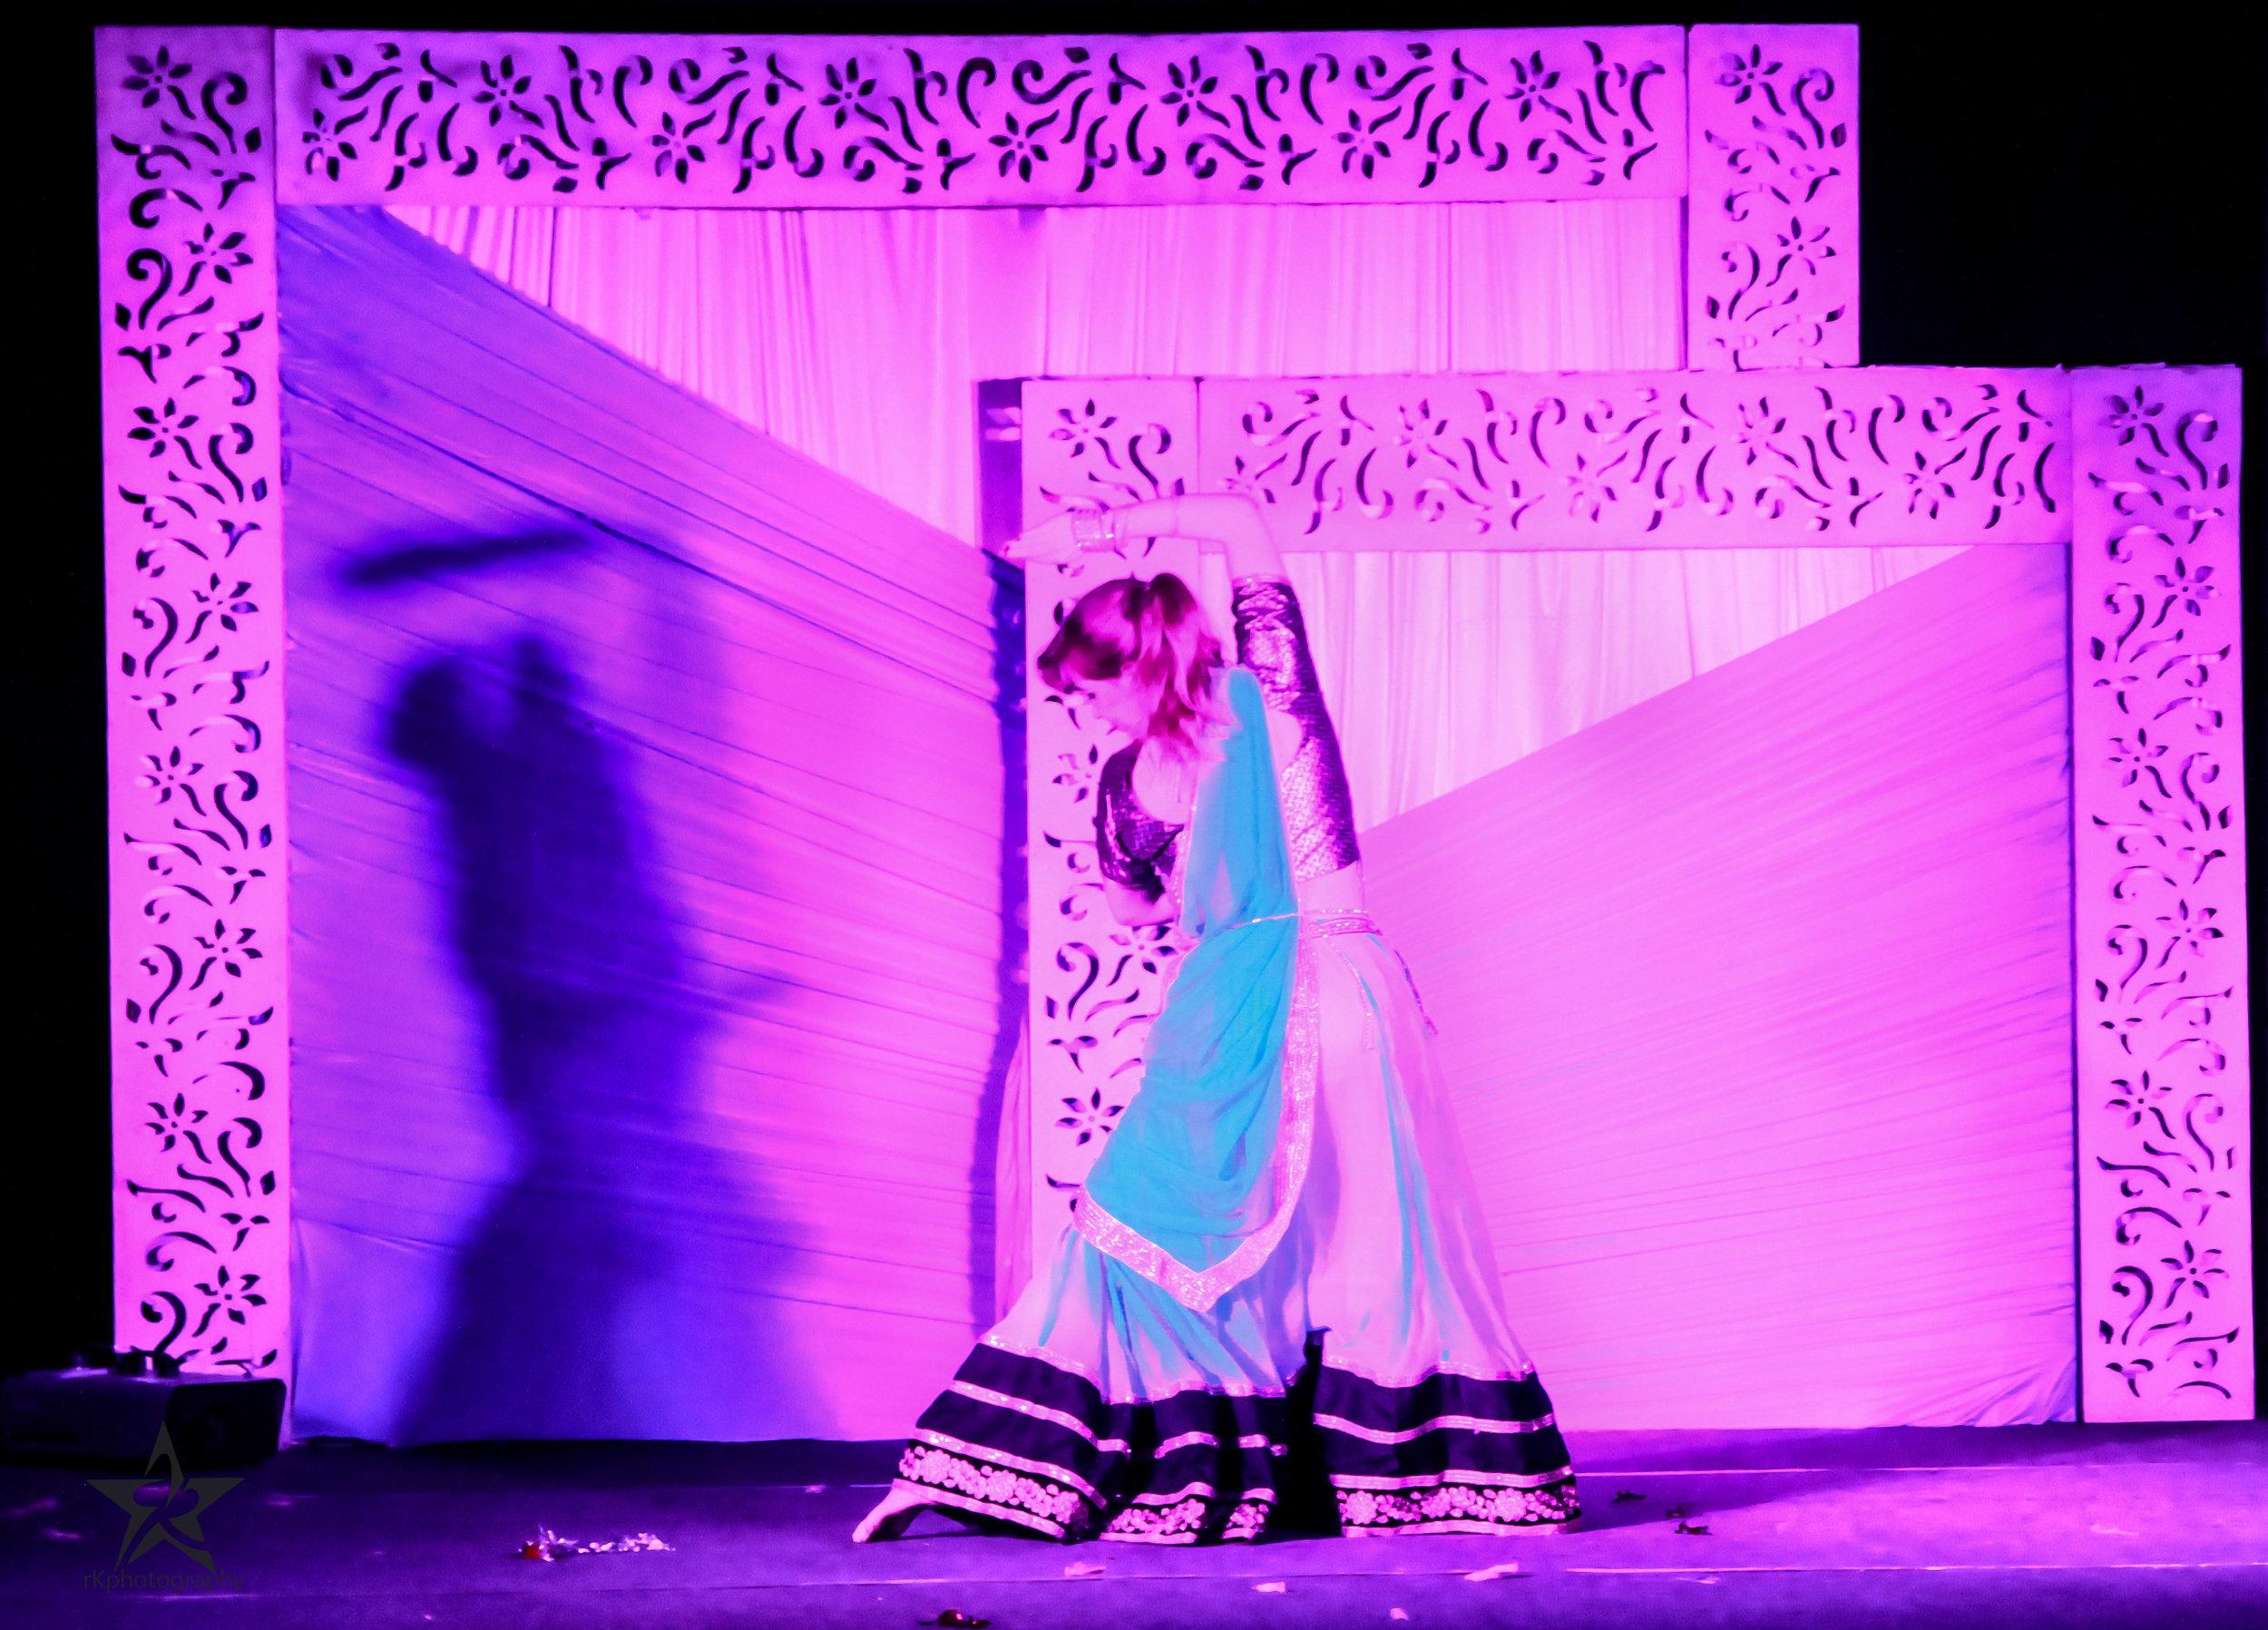 @ Ravikant Pandit, Bhubaneshwar, India